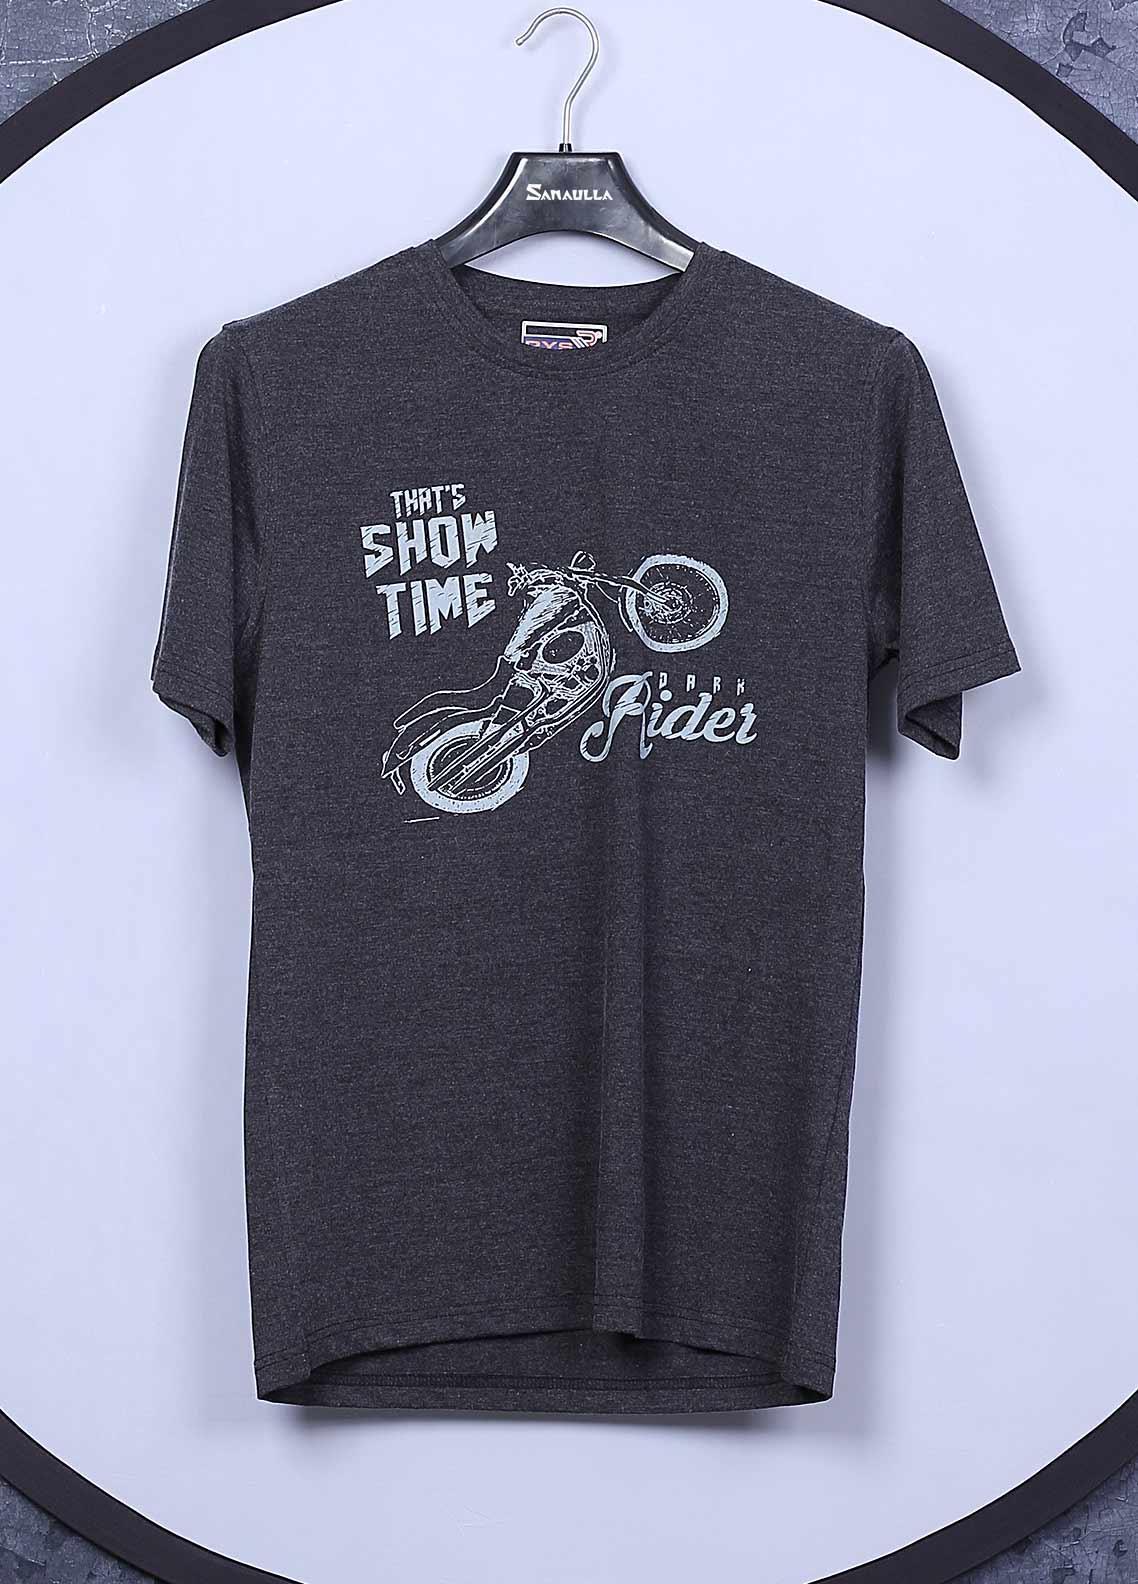 Sanaulla Exclusive Range Cotton Casual T-Shirts for Mens -  5396 Dark Grey